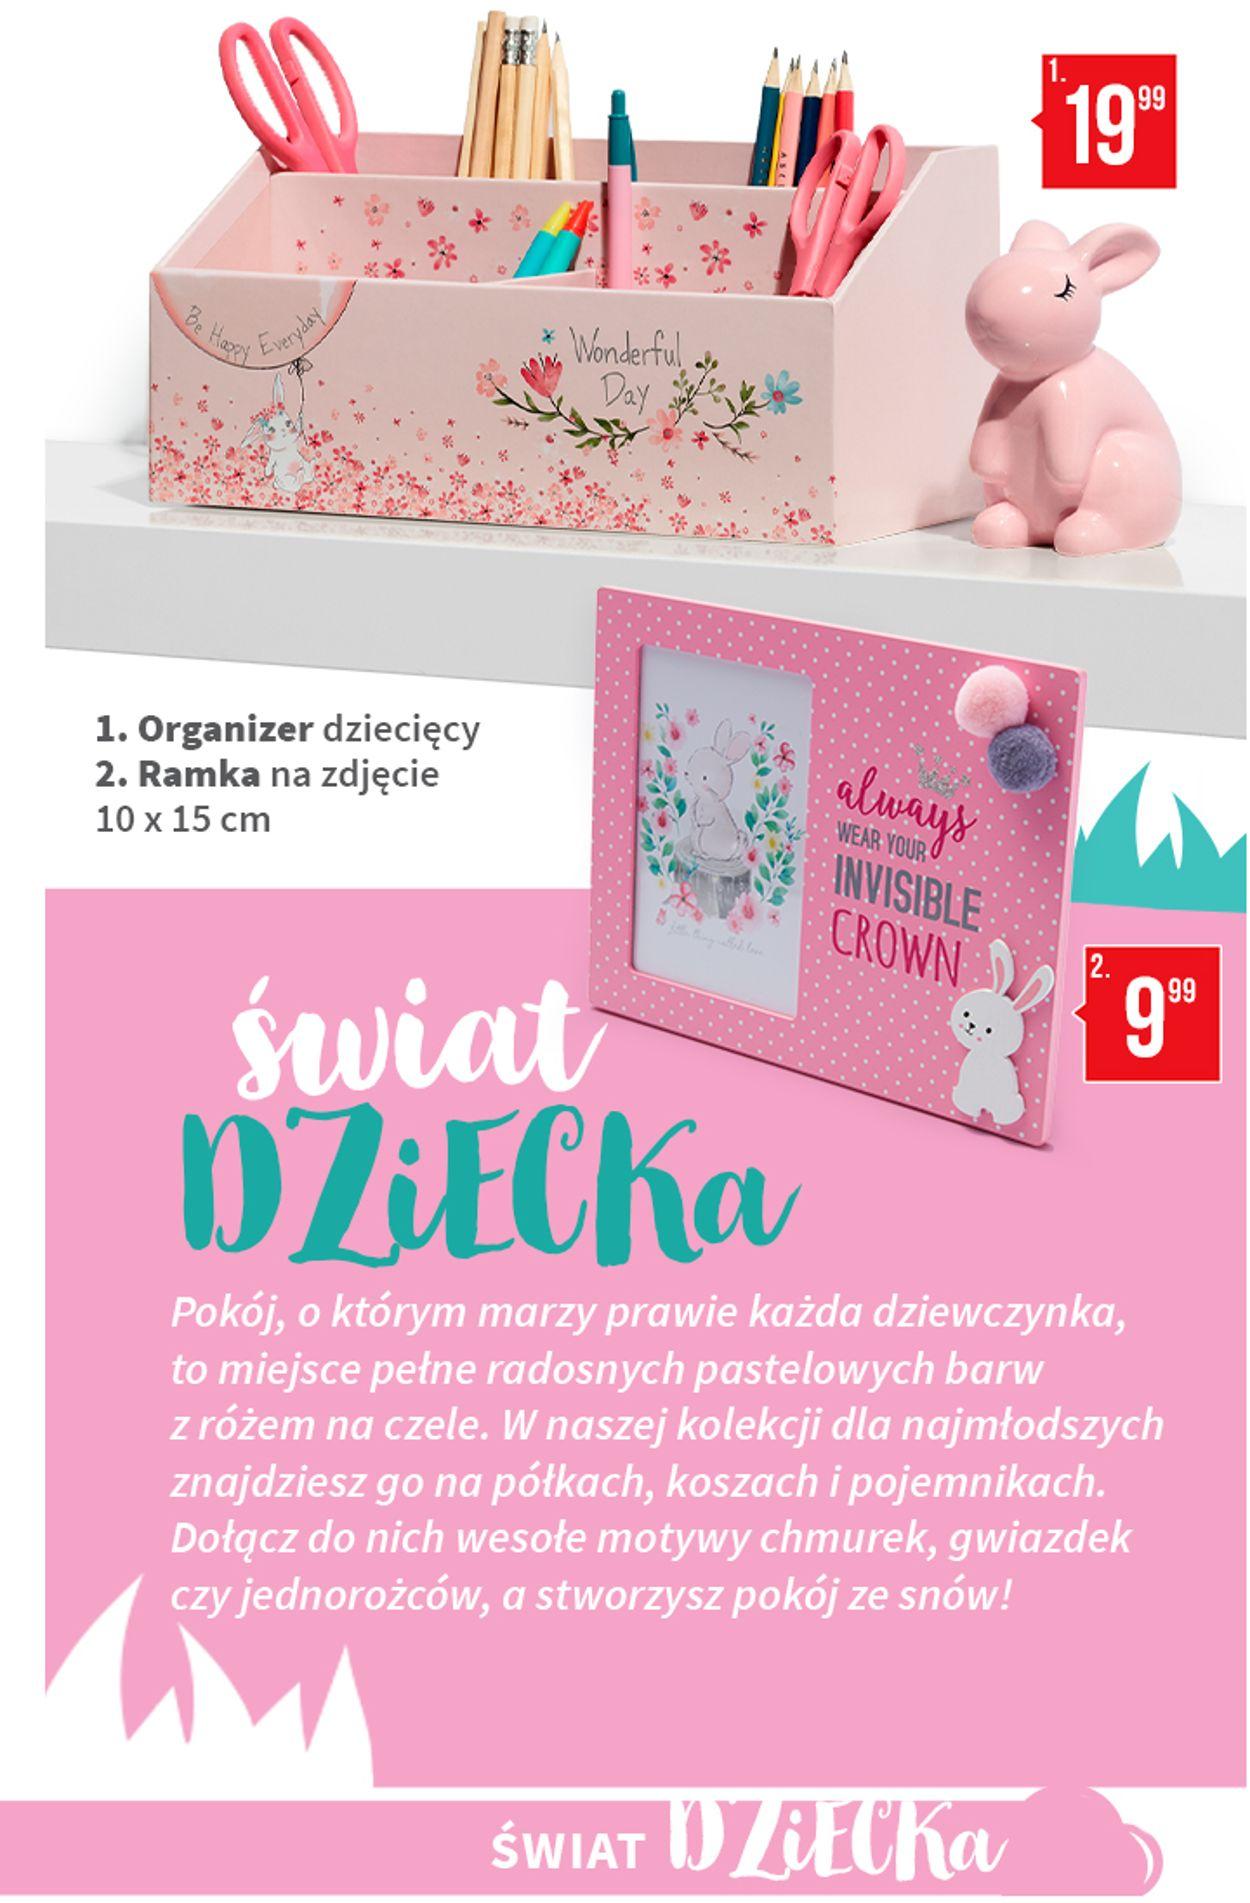 Gazetka promocyjna Pepco - 28.04-06.06.2020